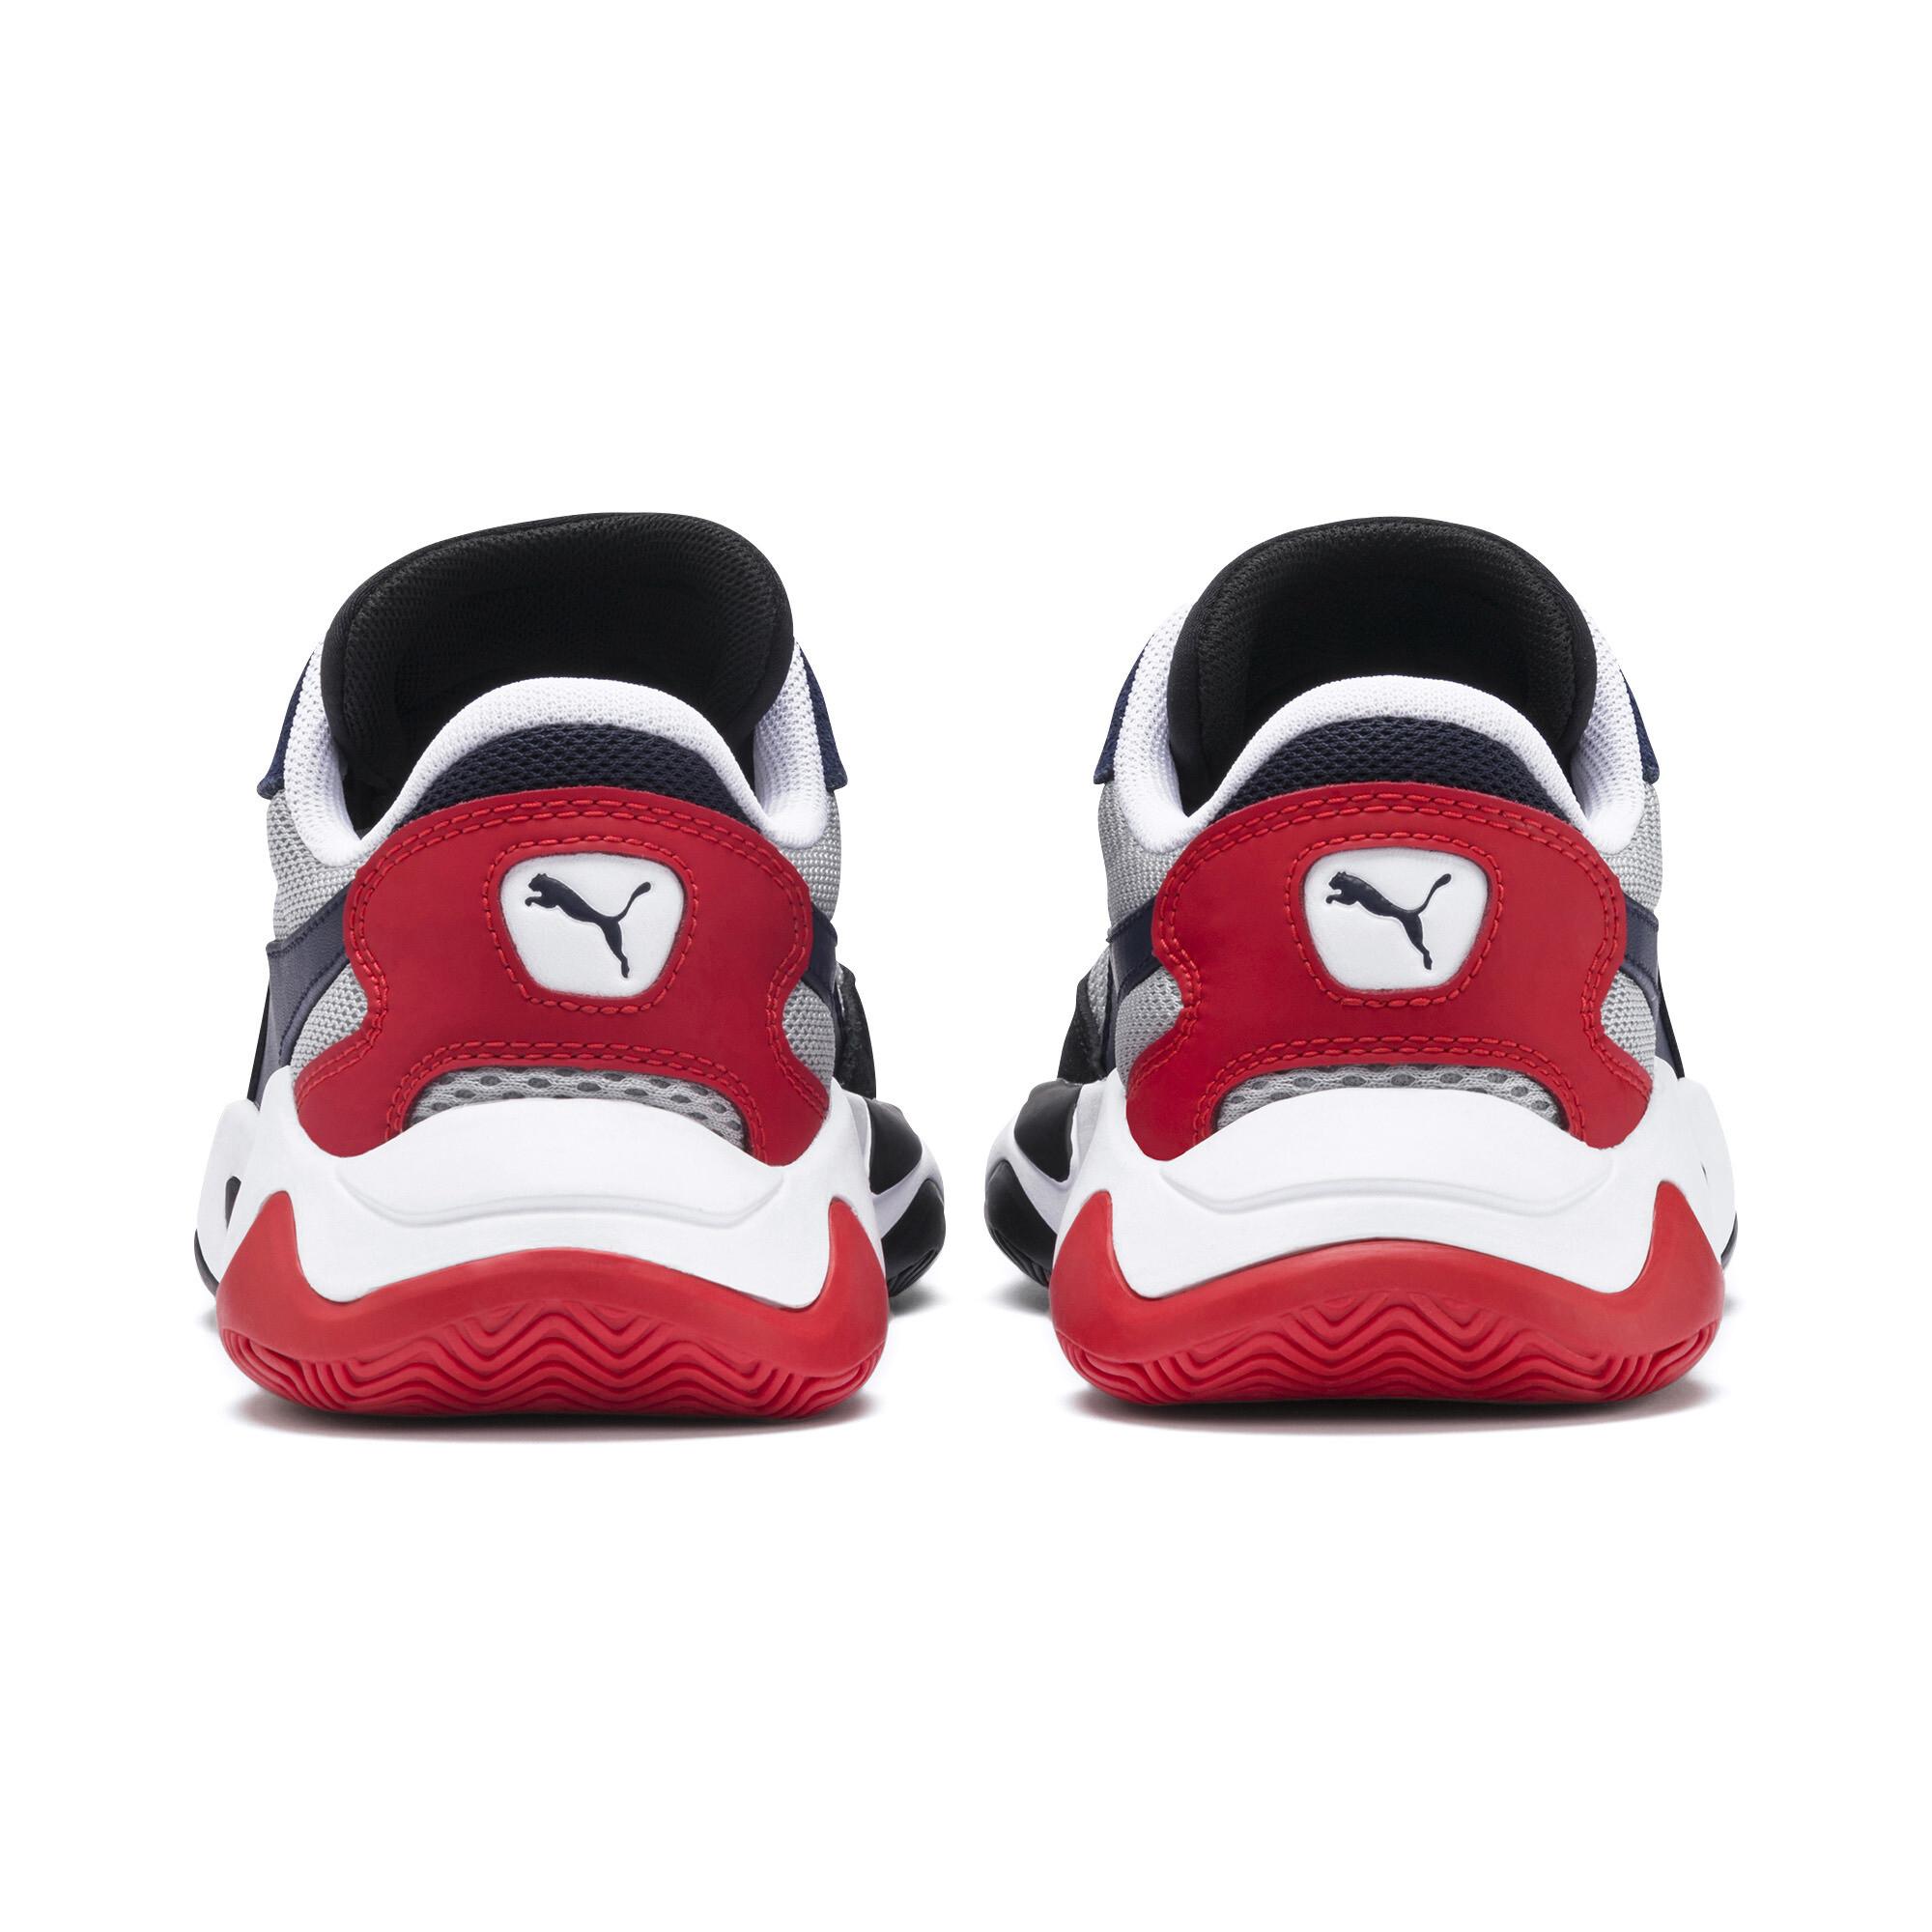 PUMA-Storm-Origin-Sneakers-JR-Kids-Shoe-Kids thumbnail 3